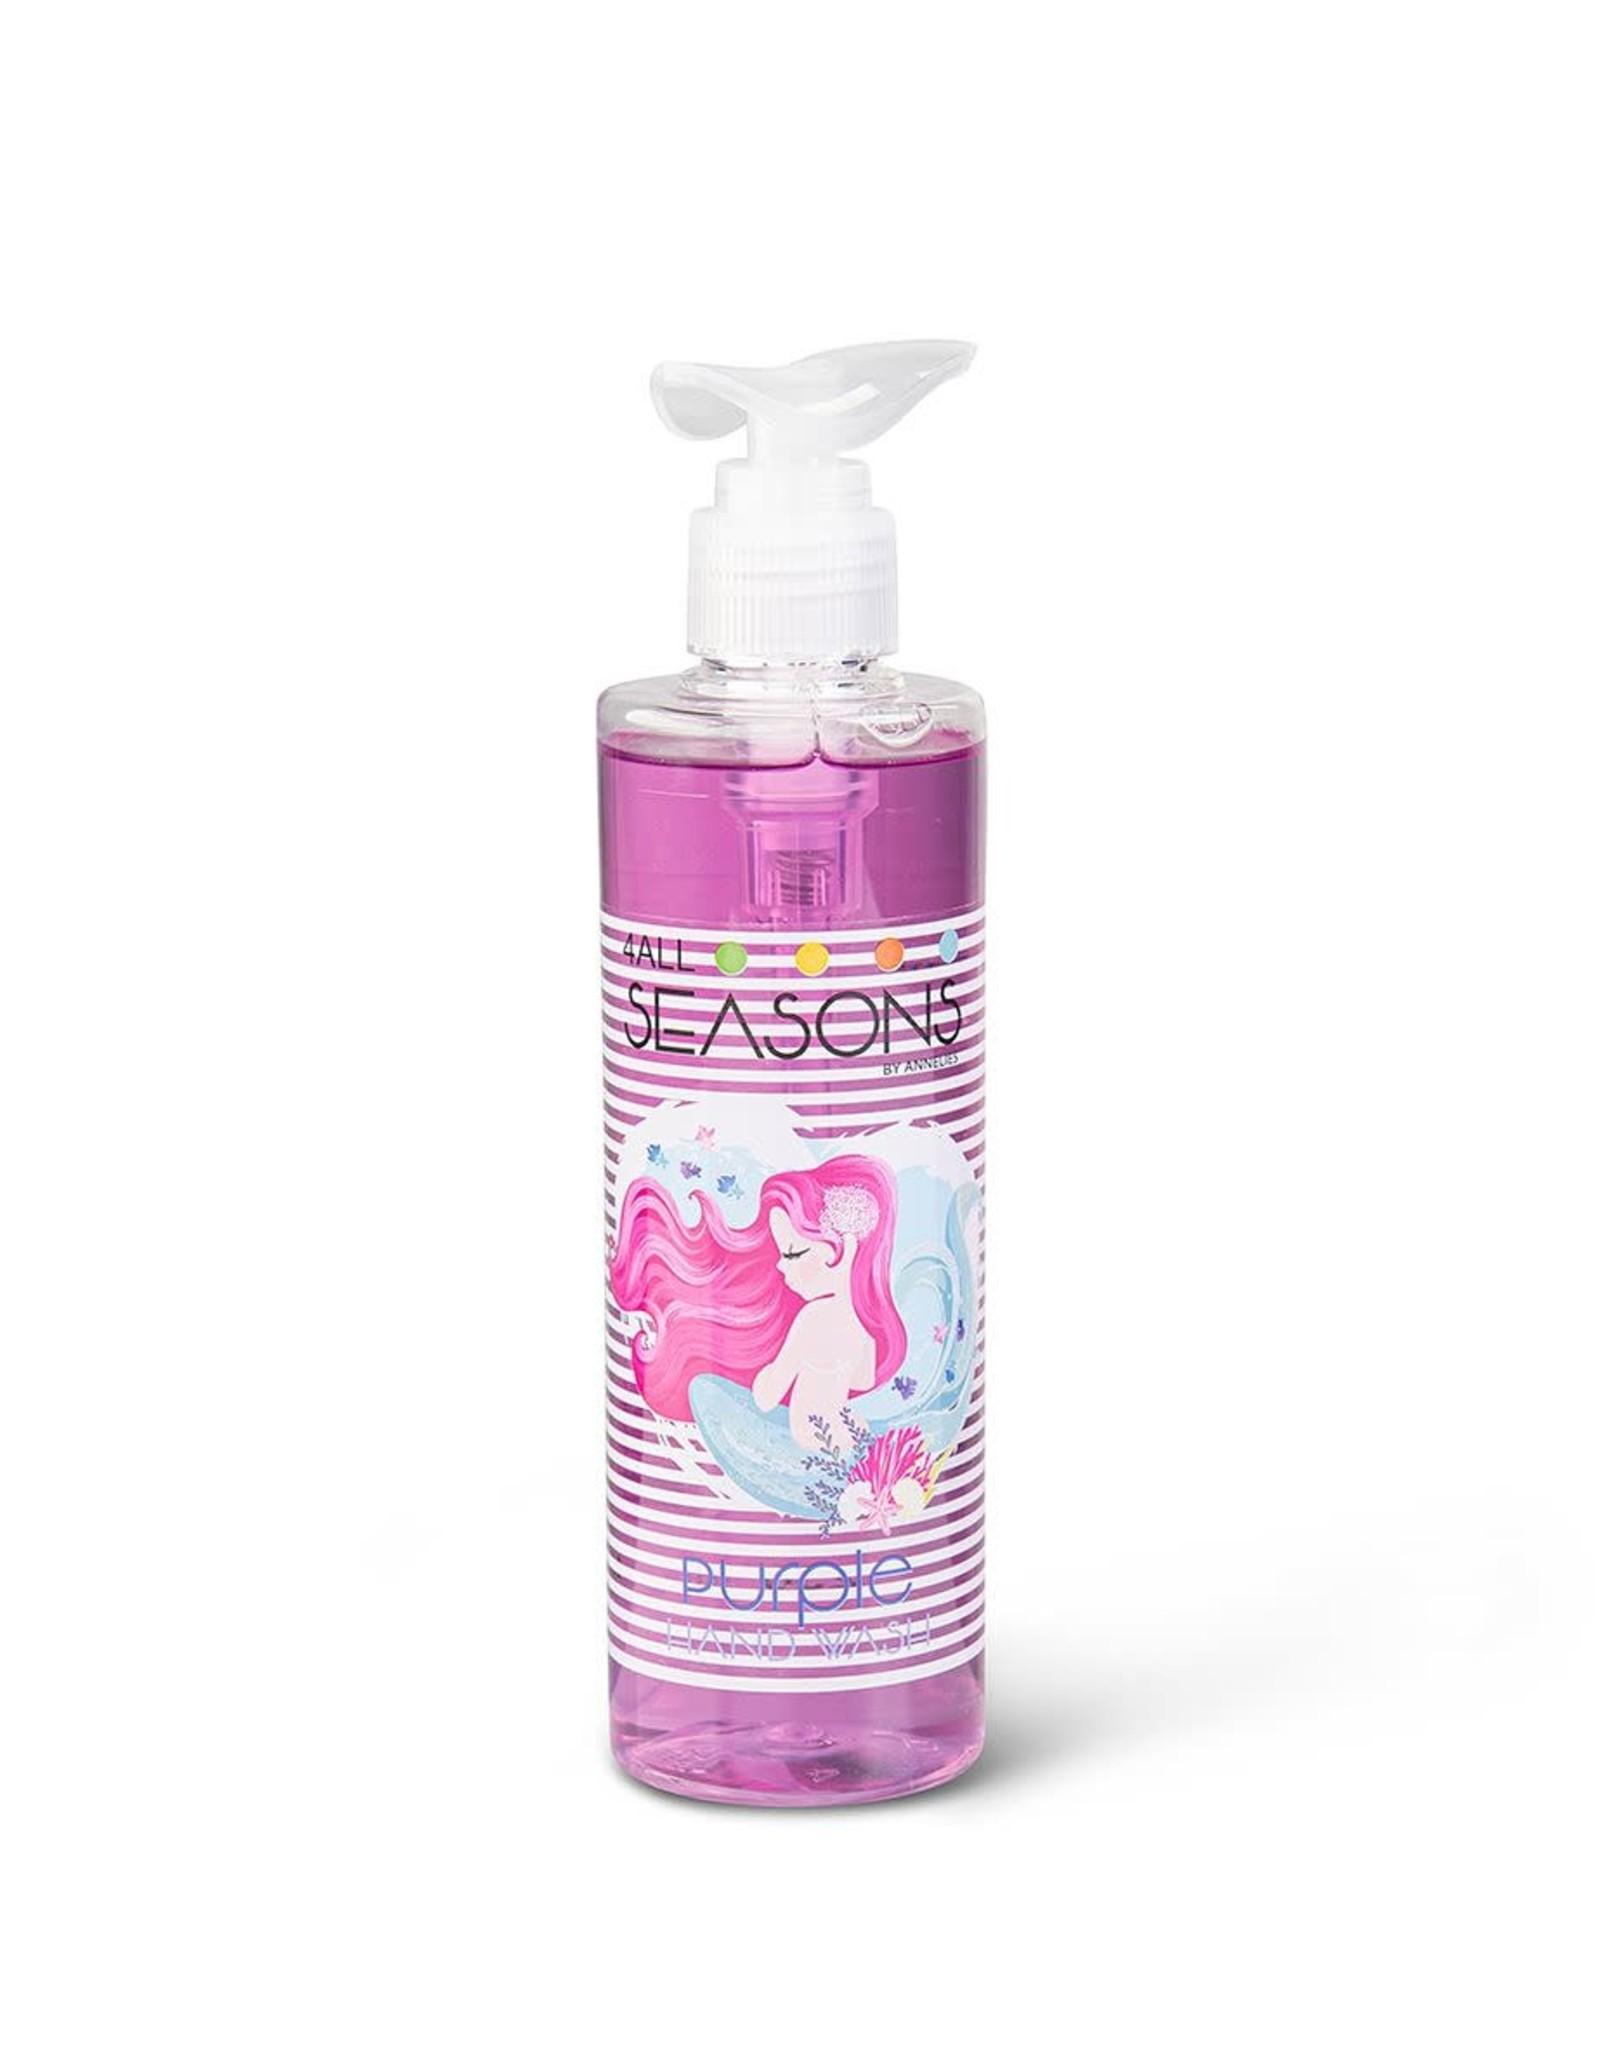 4 all seasons 4 All seasons hand wash Purple mermaid 250 ml